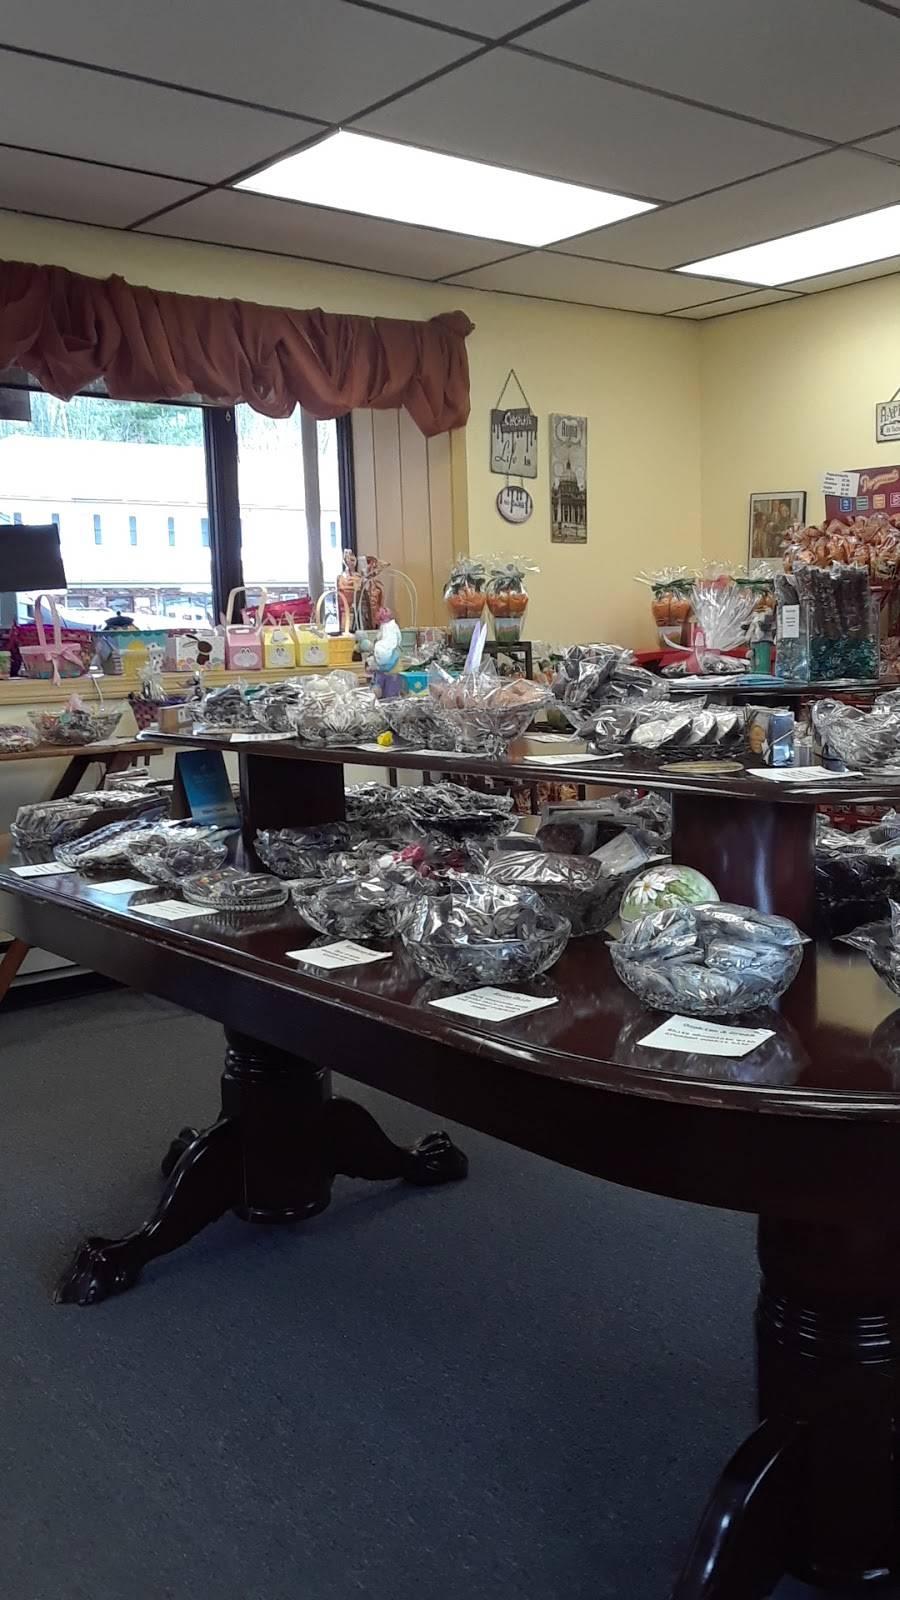 Pops Biscotti & Chocolates   bakery   2341 Boston Rd, Wilbraham, MA 01095, USA   4135969339 OR +1 413-596-9339